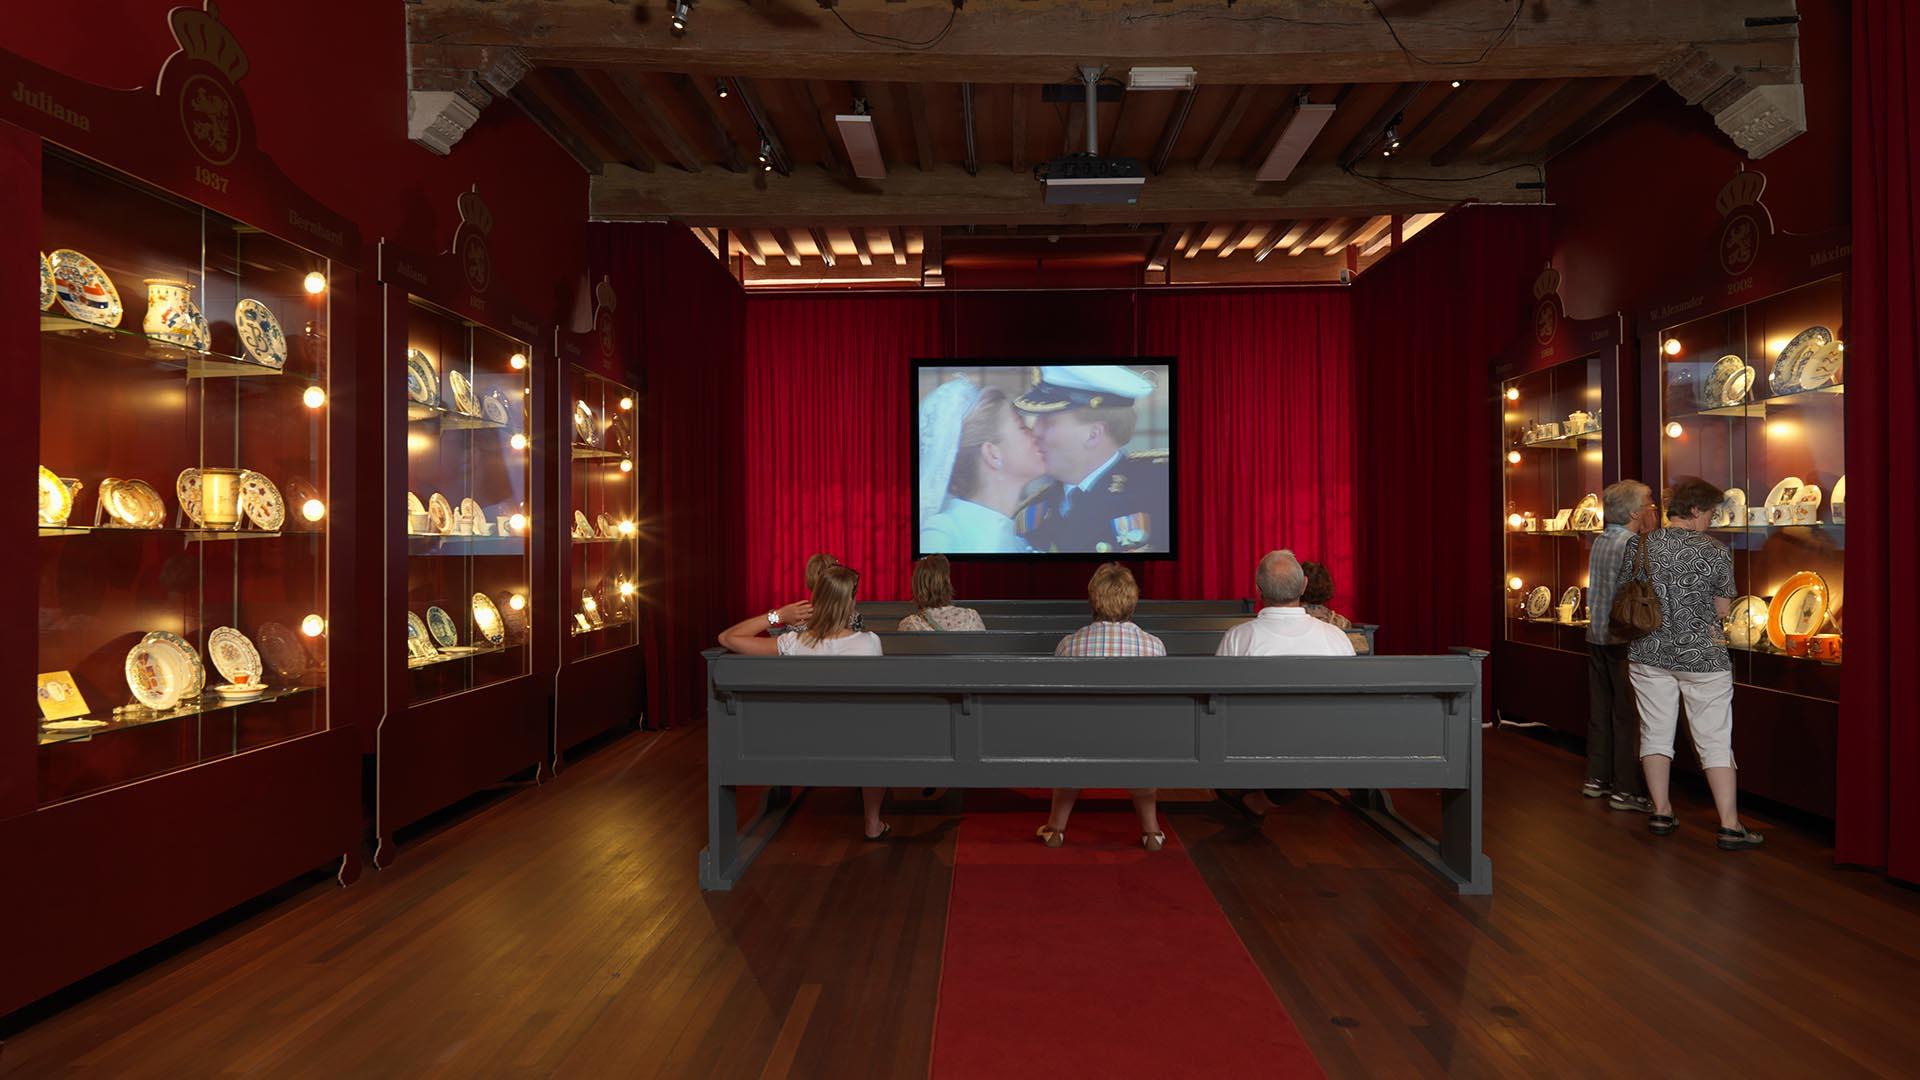 Keramiekmuseum Princessehof Oranjegoed tentoonstelling